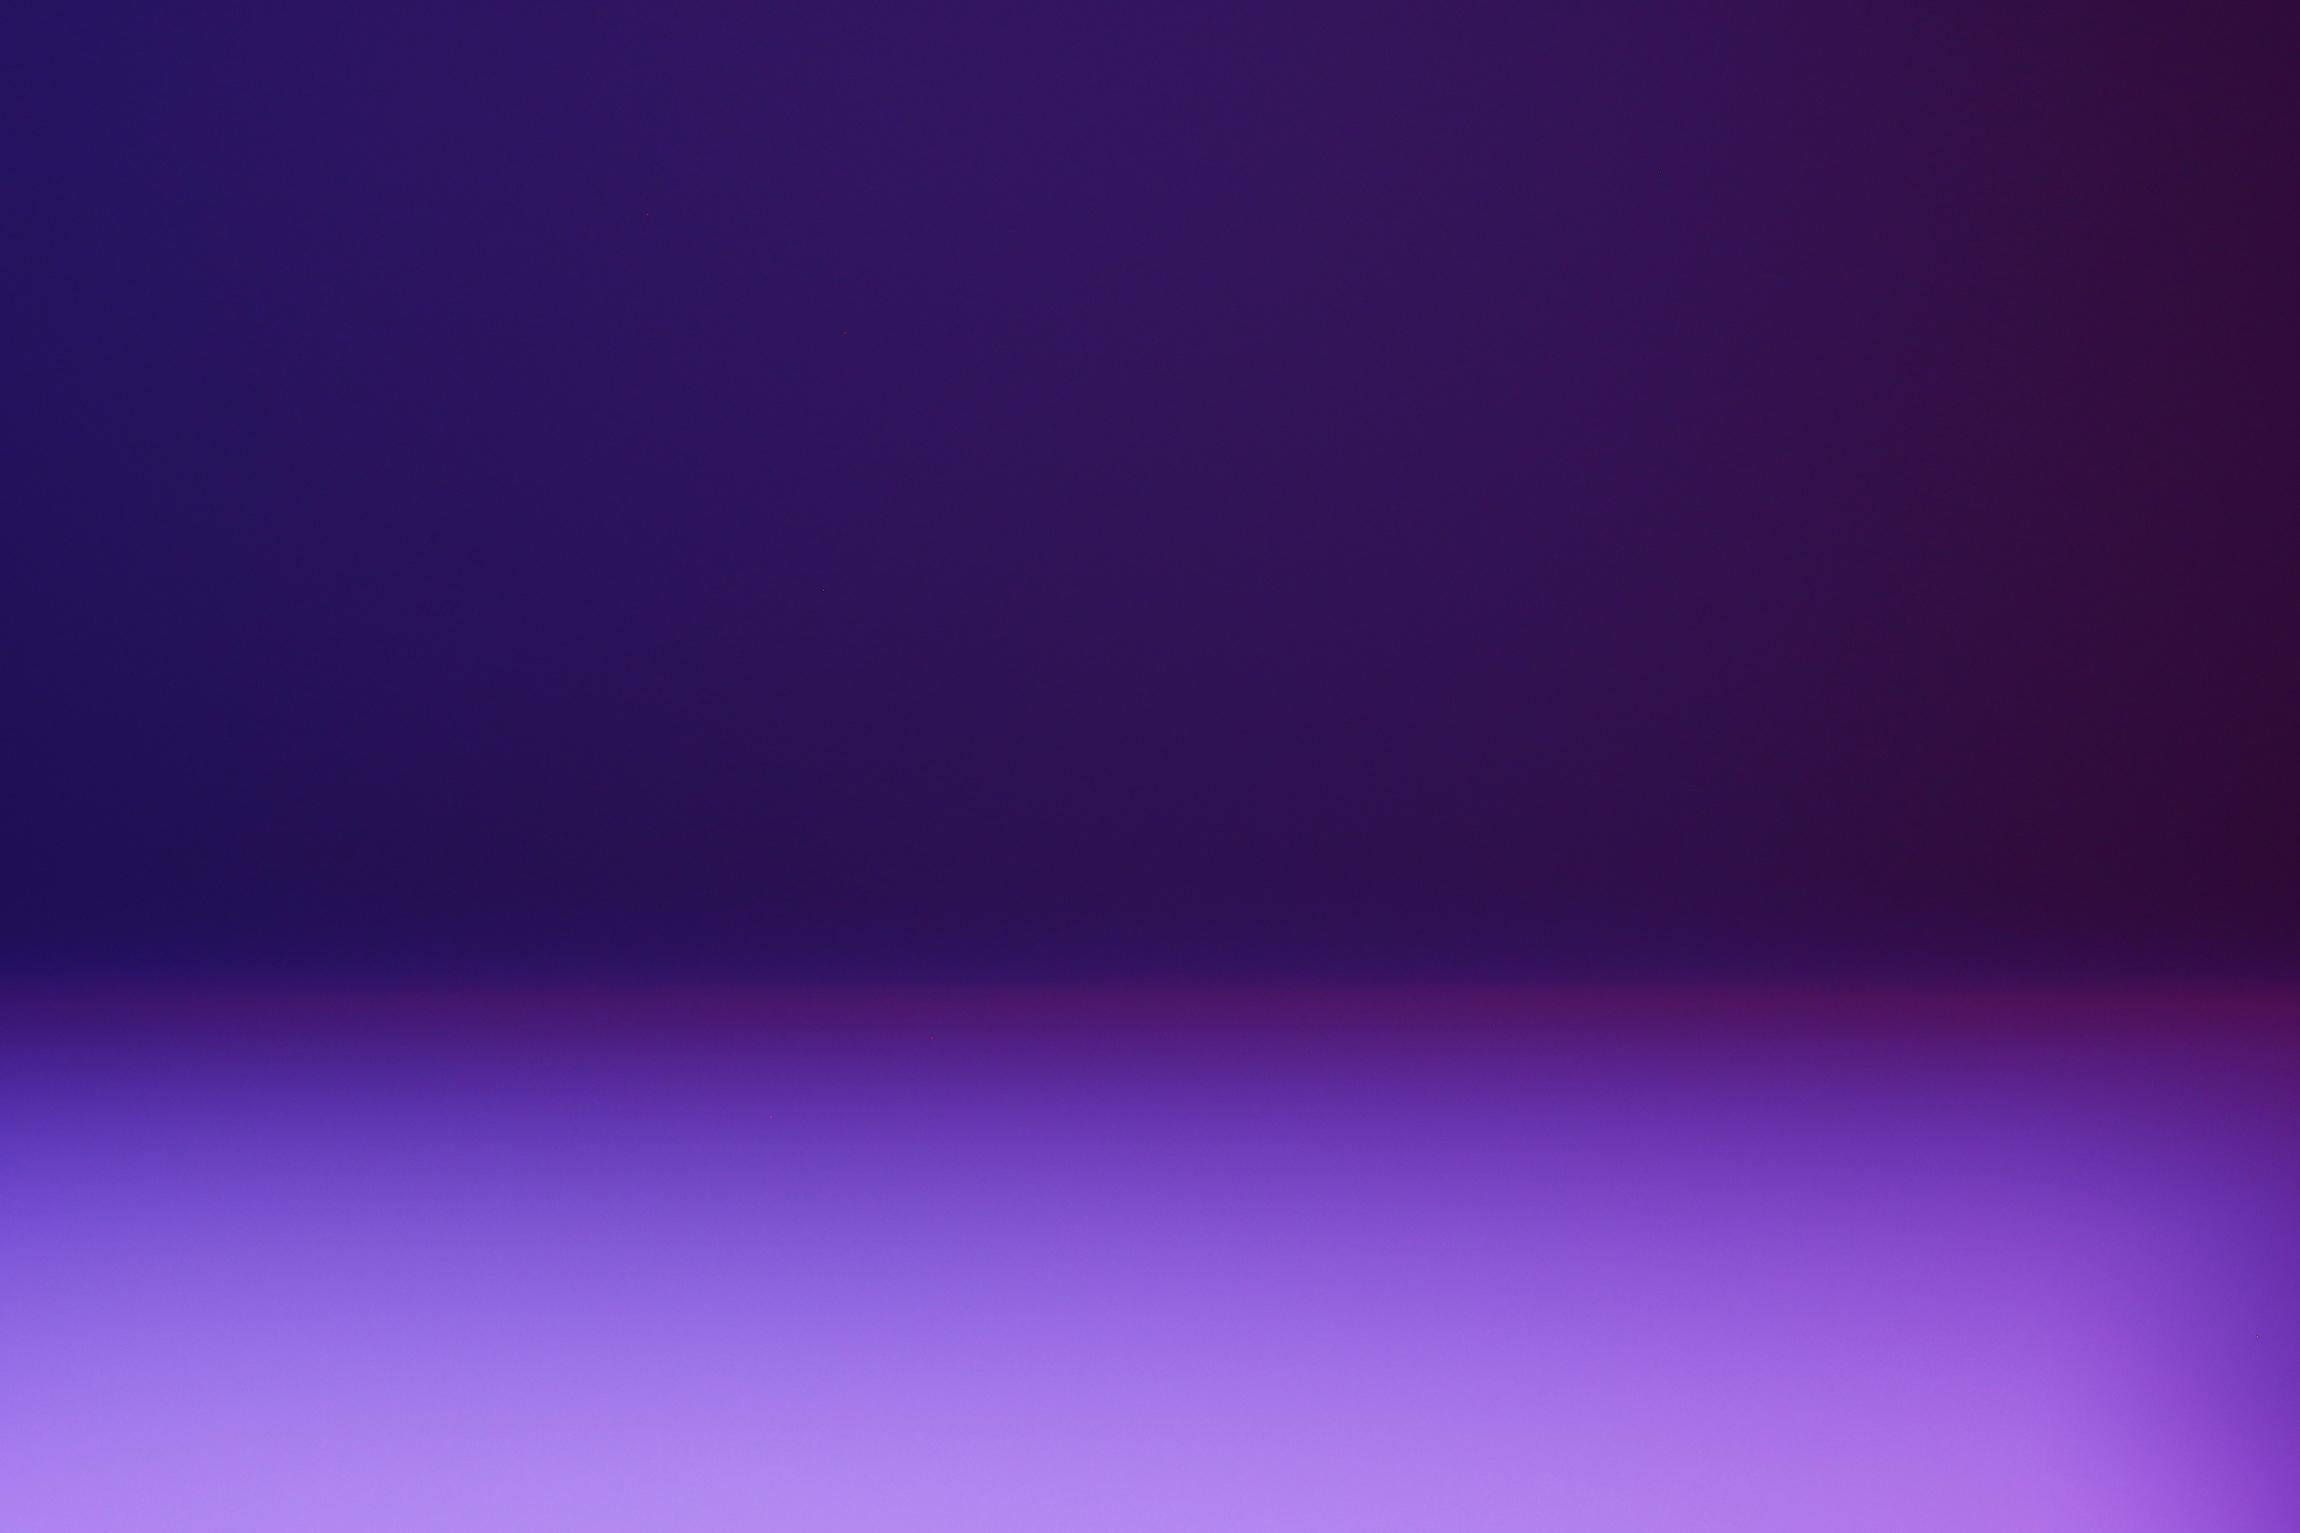 Lightfield: Purple